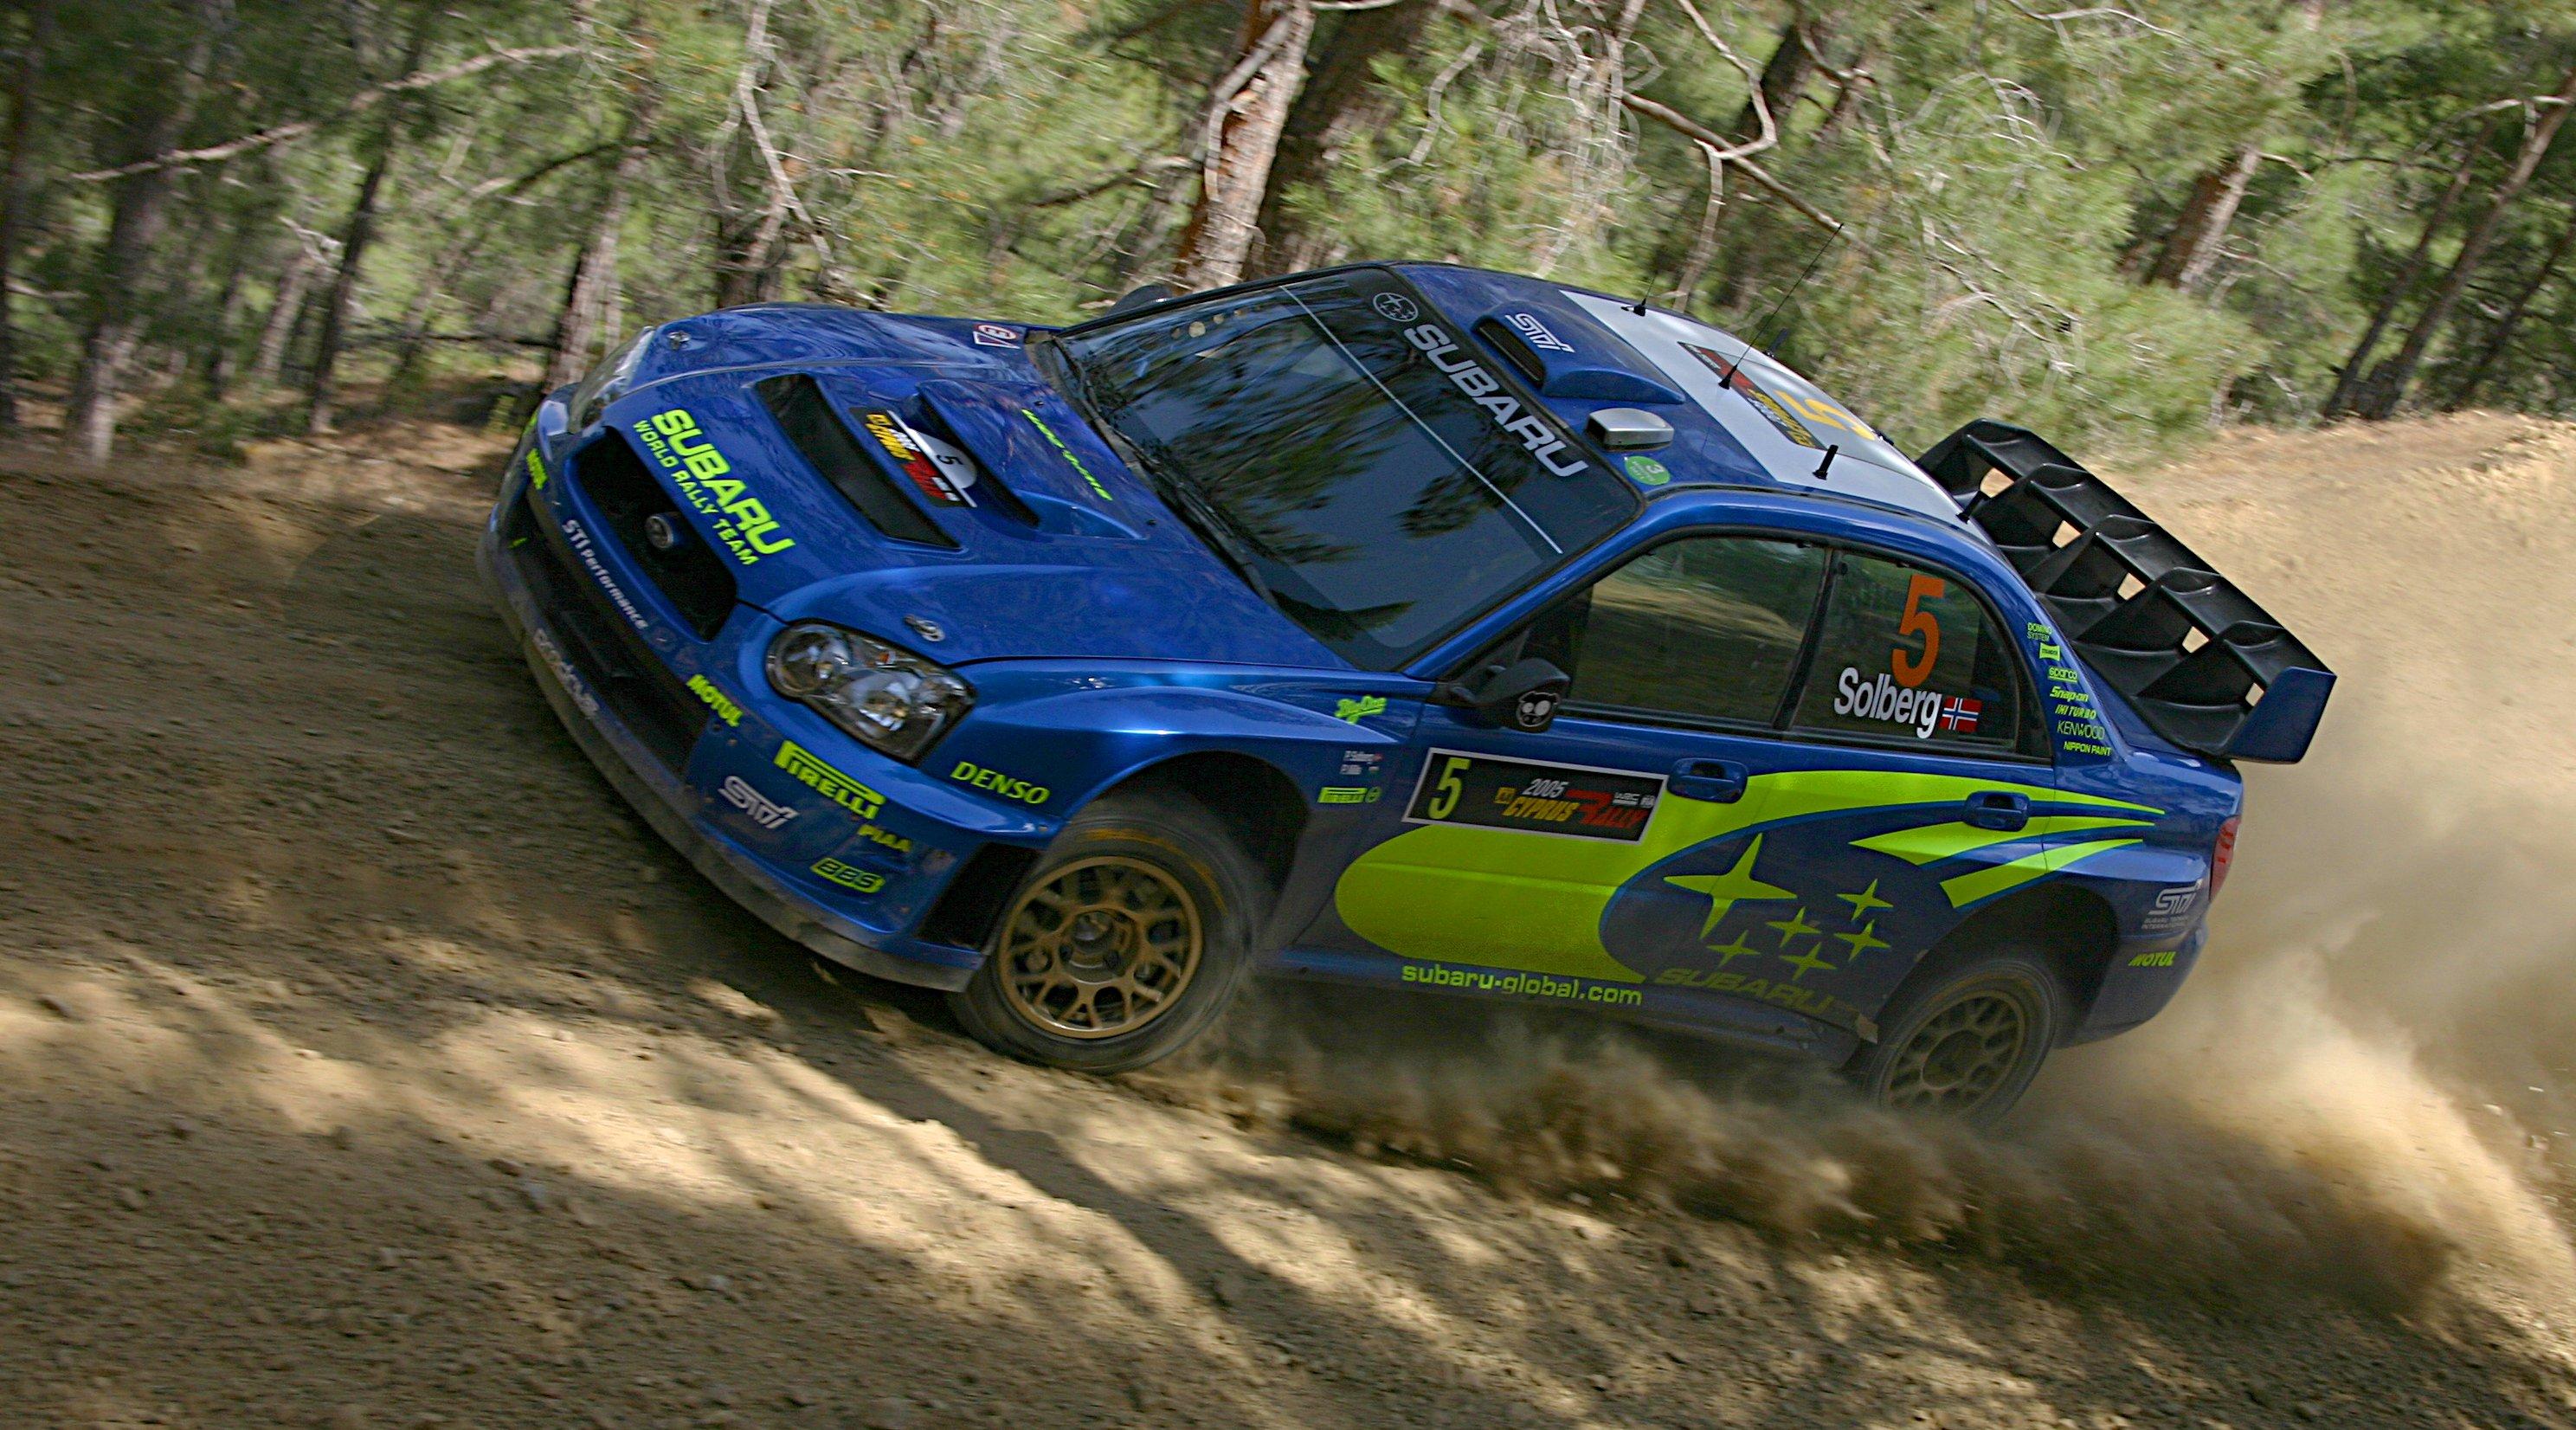 Petter_Solberg_-_2005_Cyprus_Rally.jpg